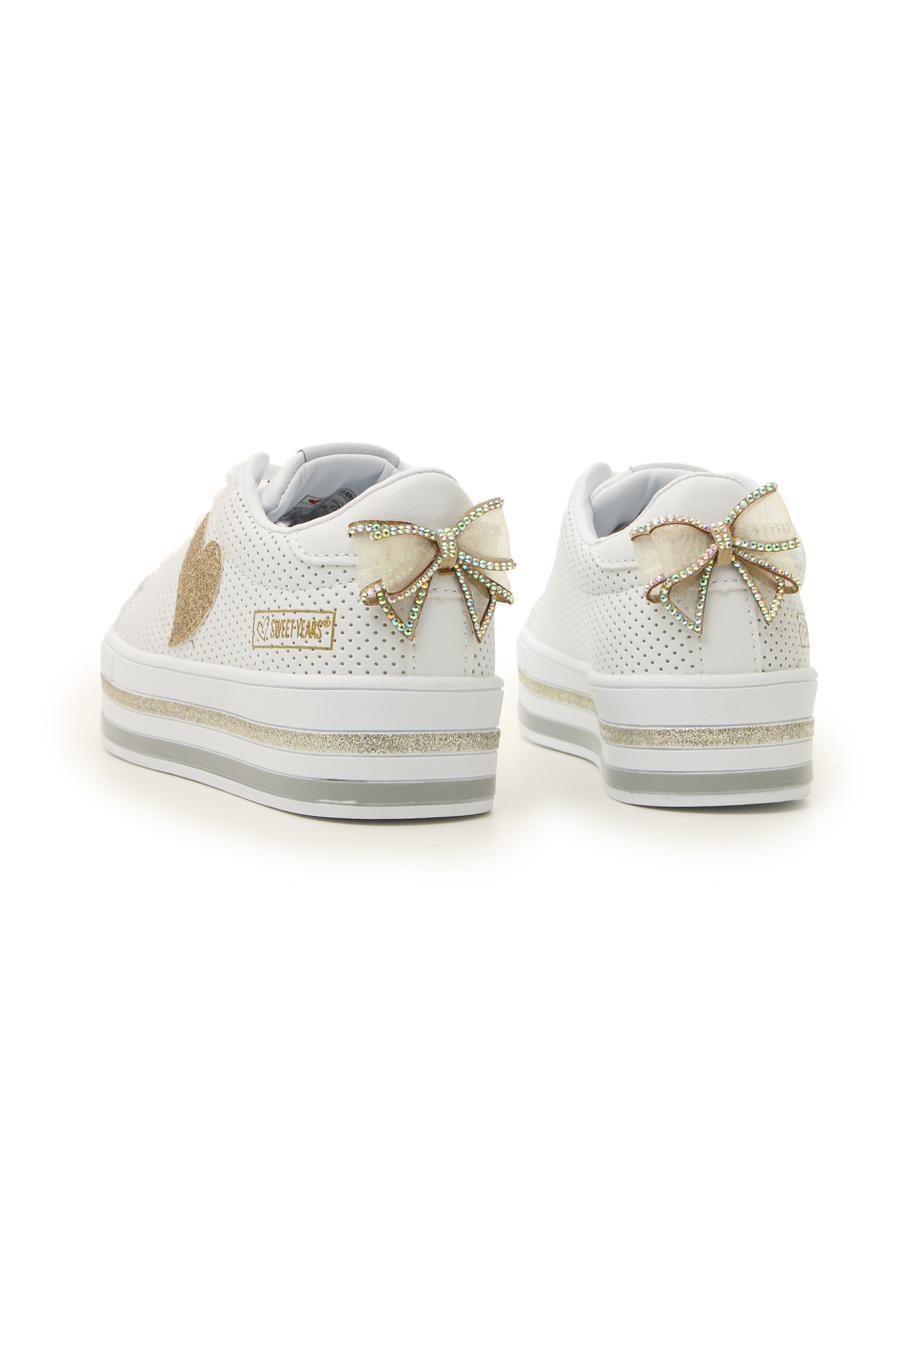 SNEAKERS SWEET YEARS 214 bambina bianco   Pittarello